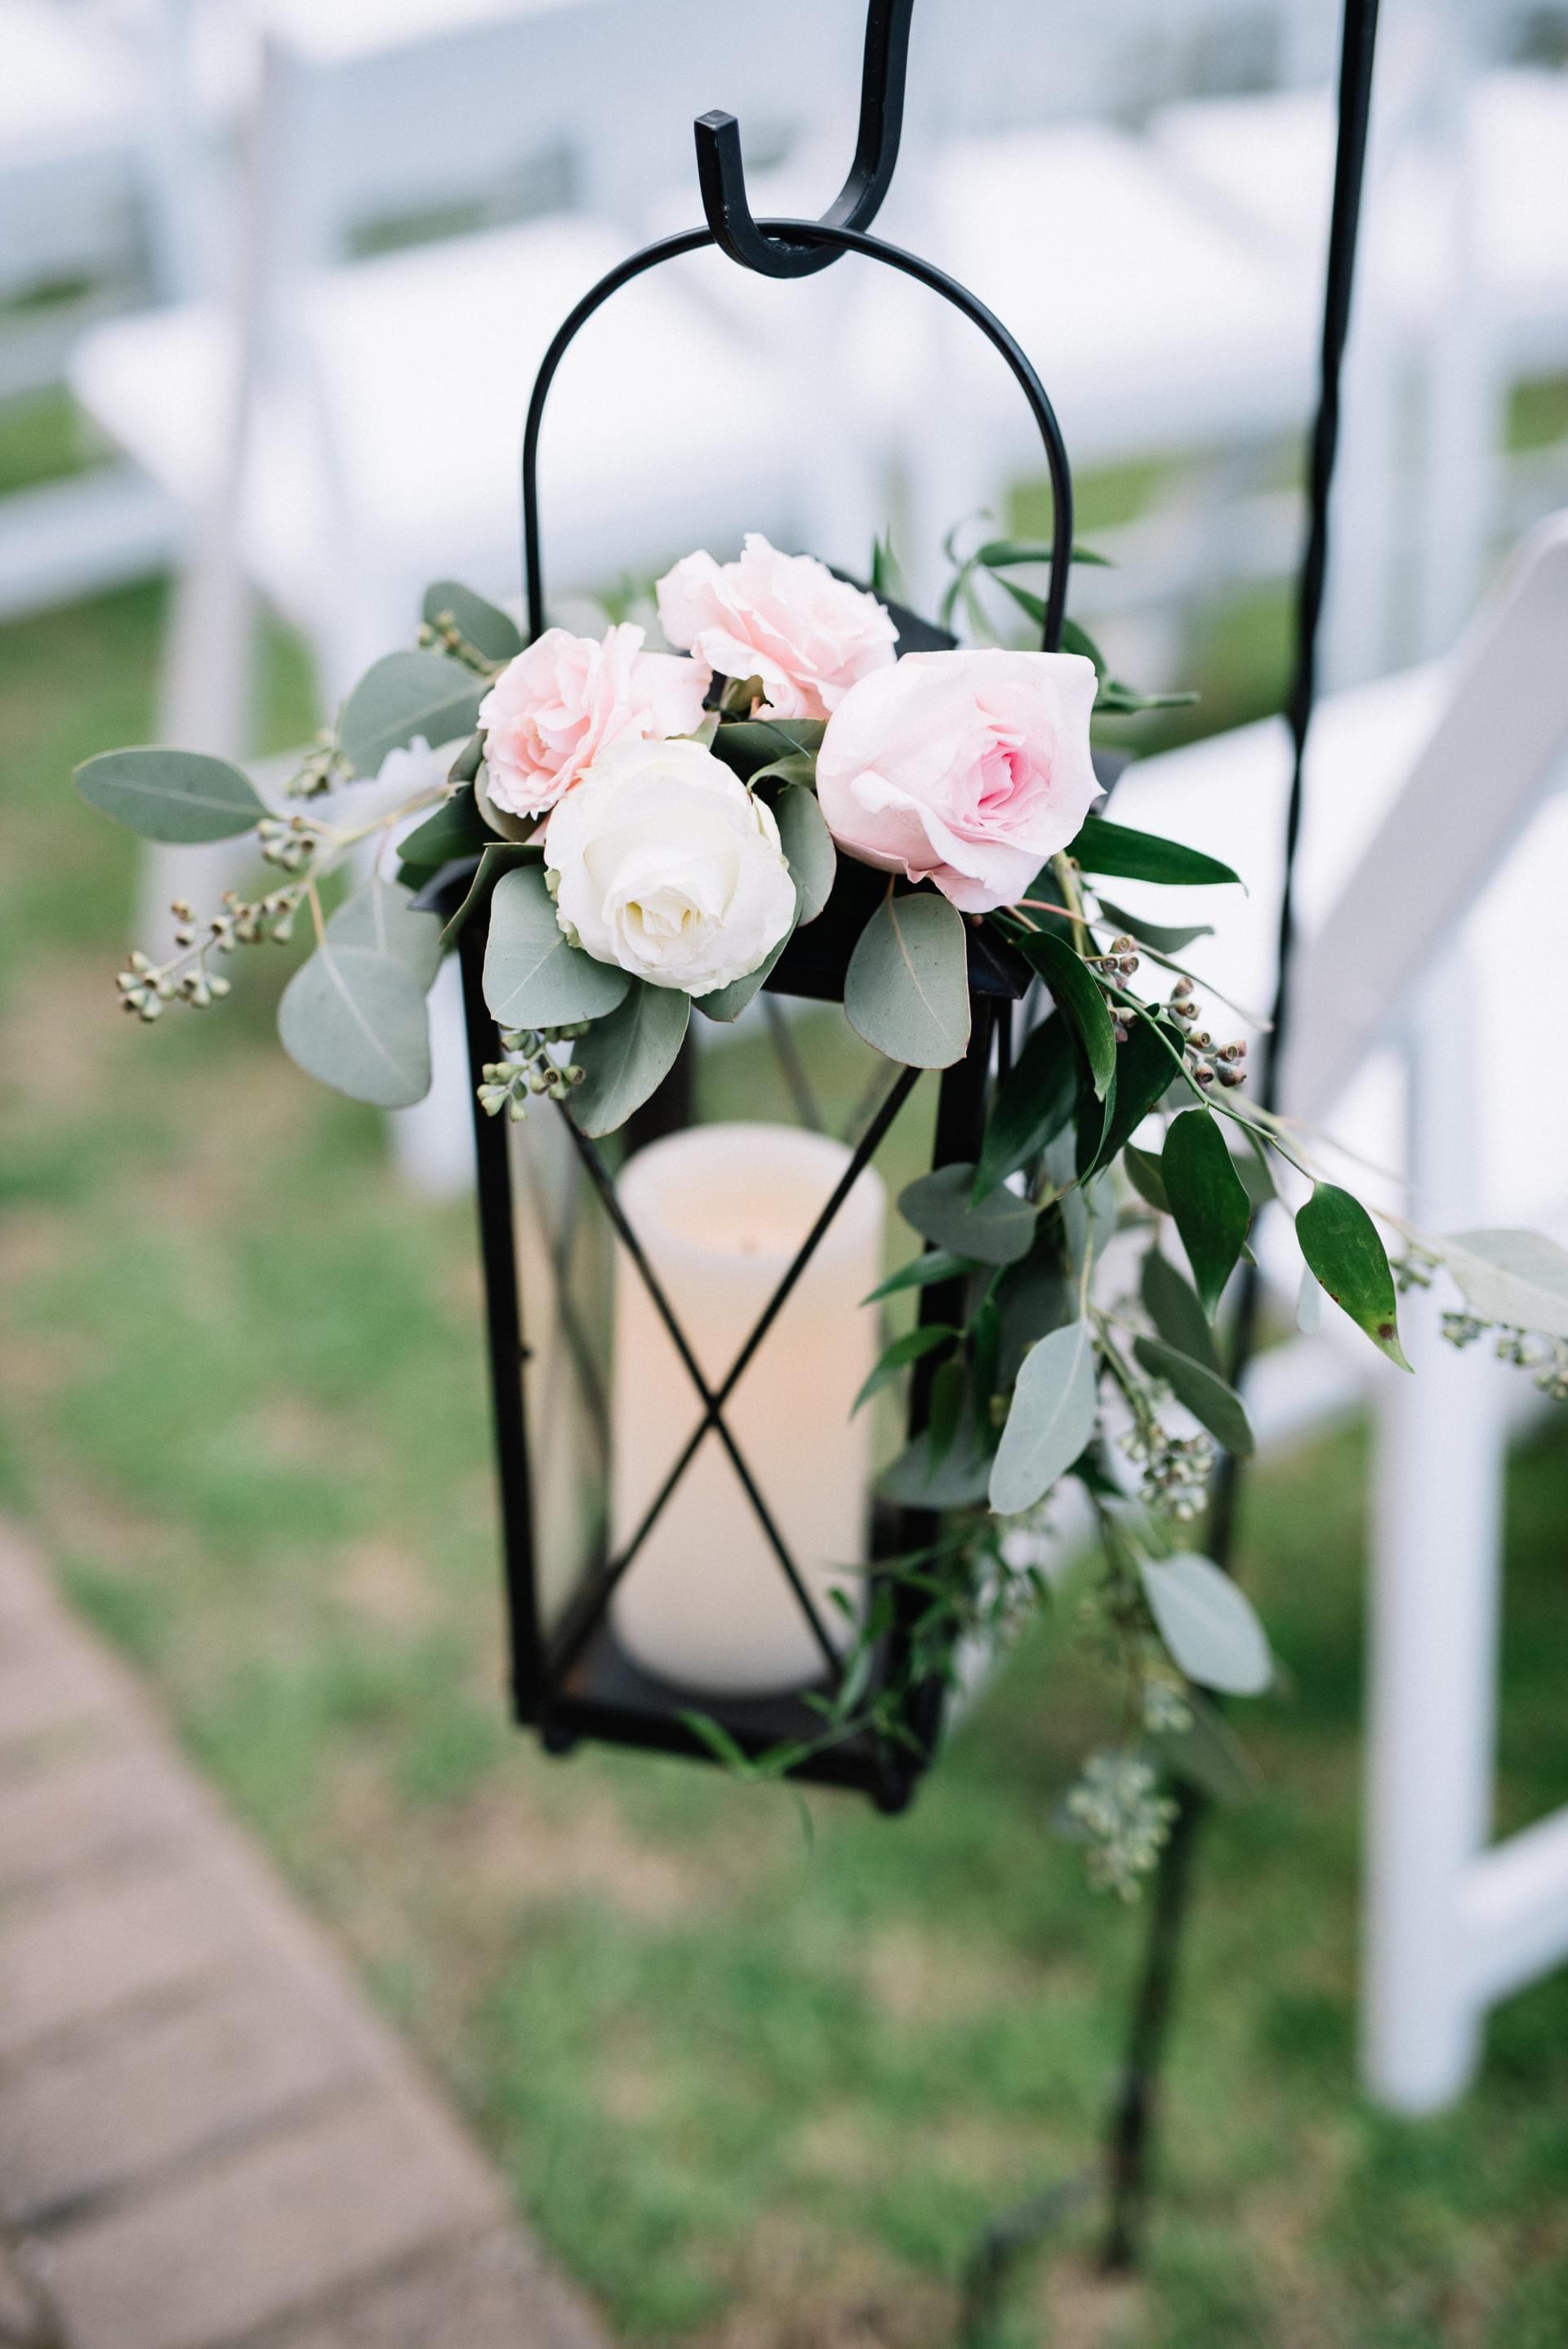 The Smarter Way To Wed Outdoor Wedding Centerpieces Wedding Aisle Decorations Wedding Aisle